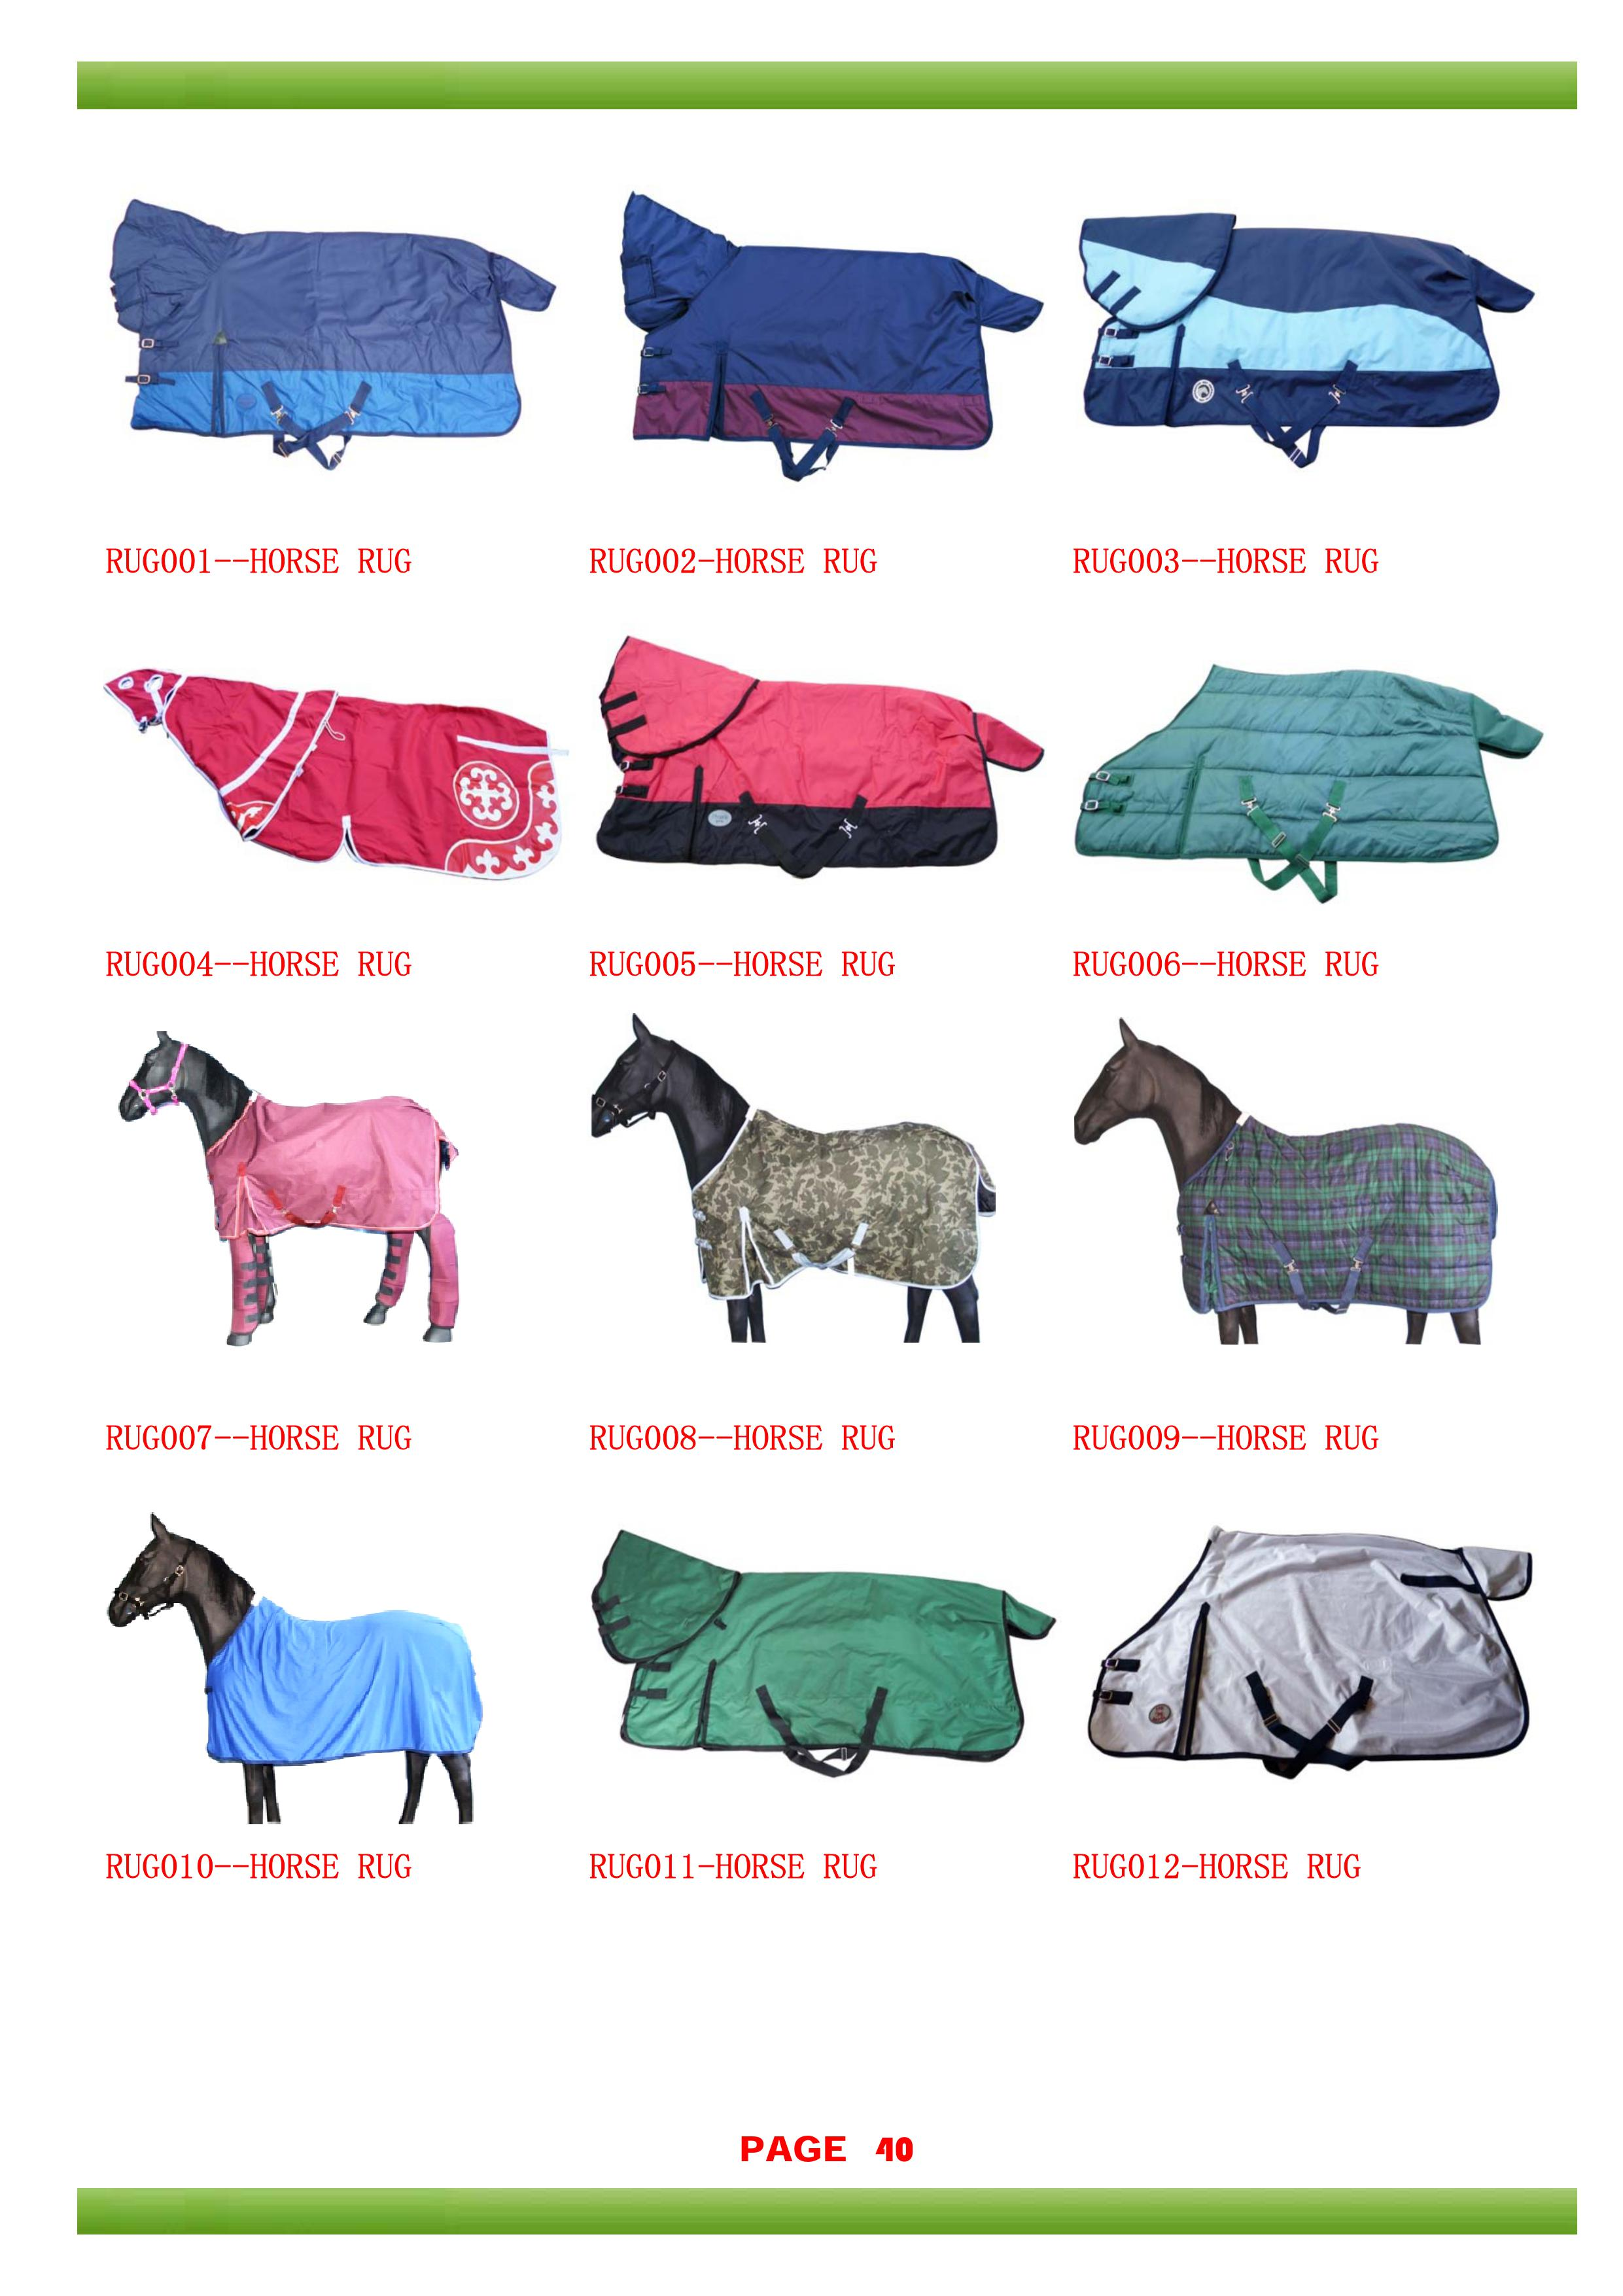 Horse Blanket Rug View Fly Rugs